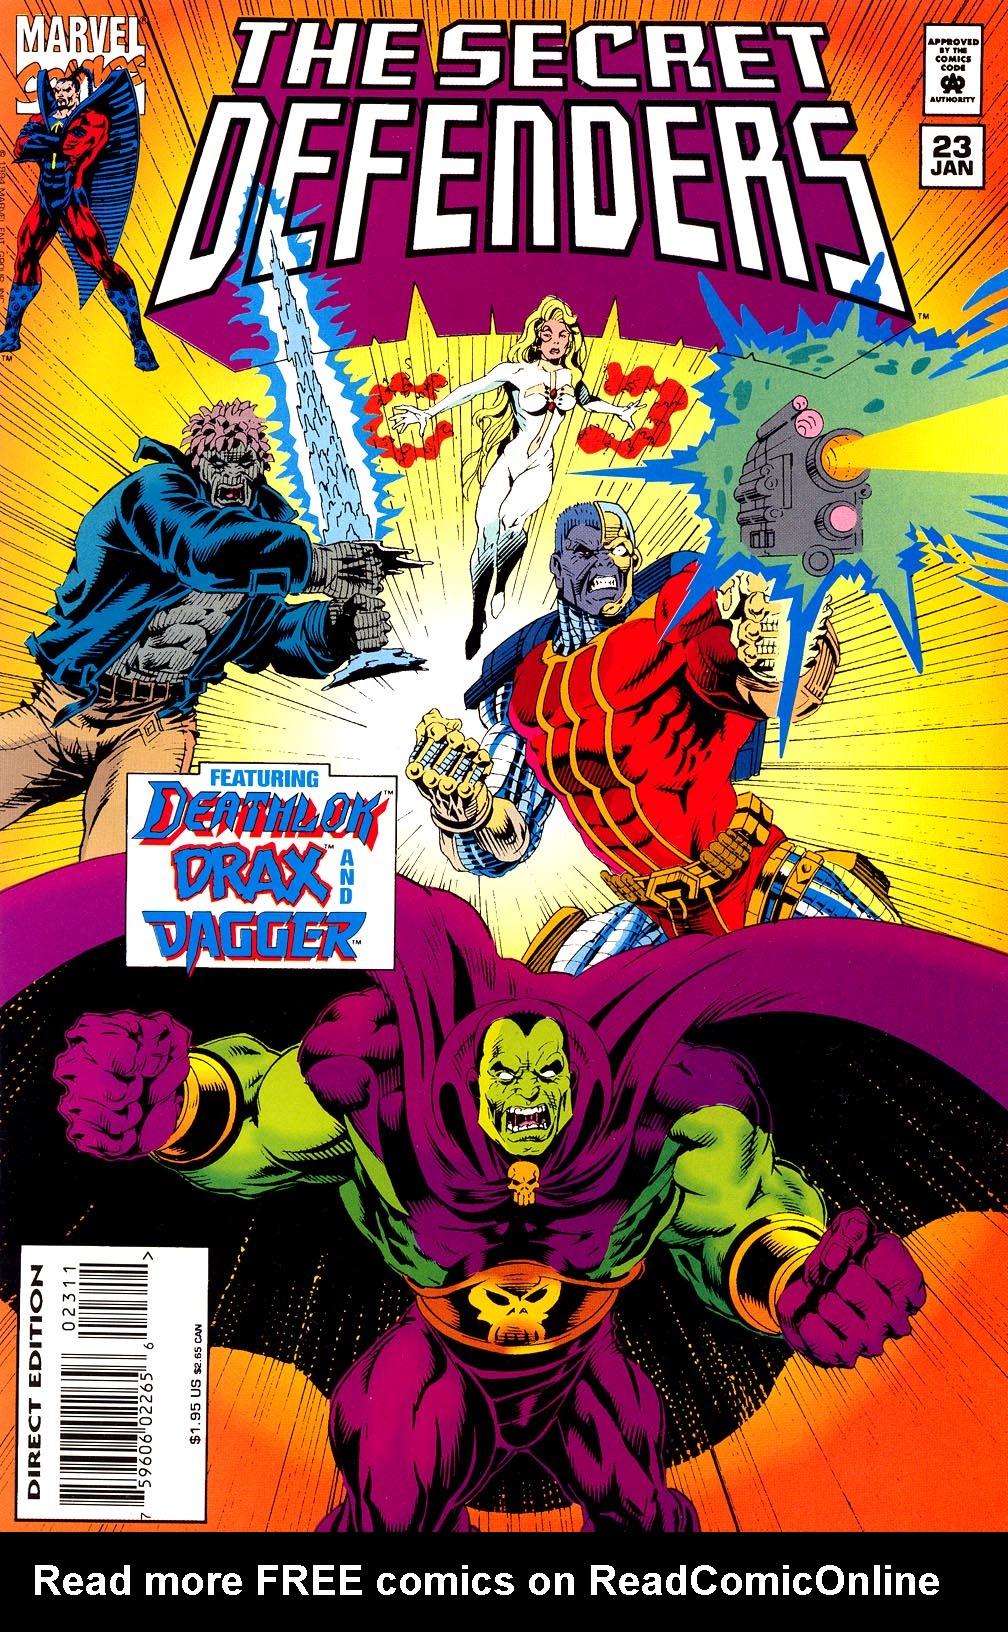 Read online Secret Defenders comic -  Issue #23 - 1